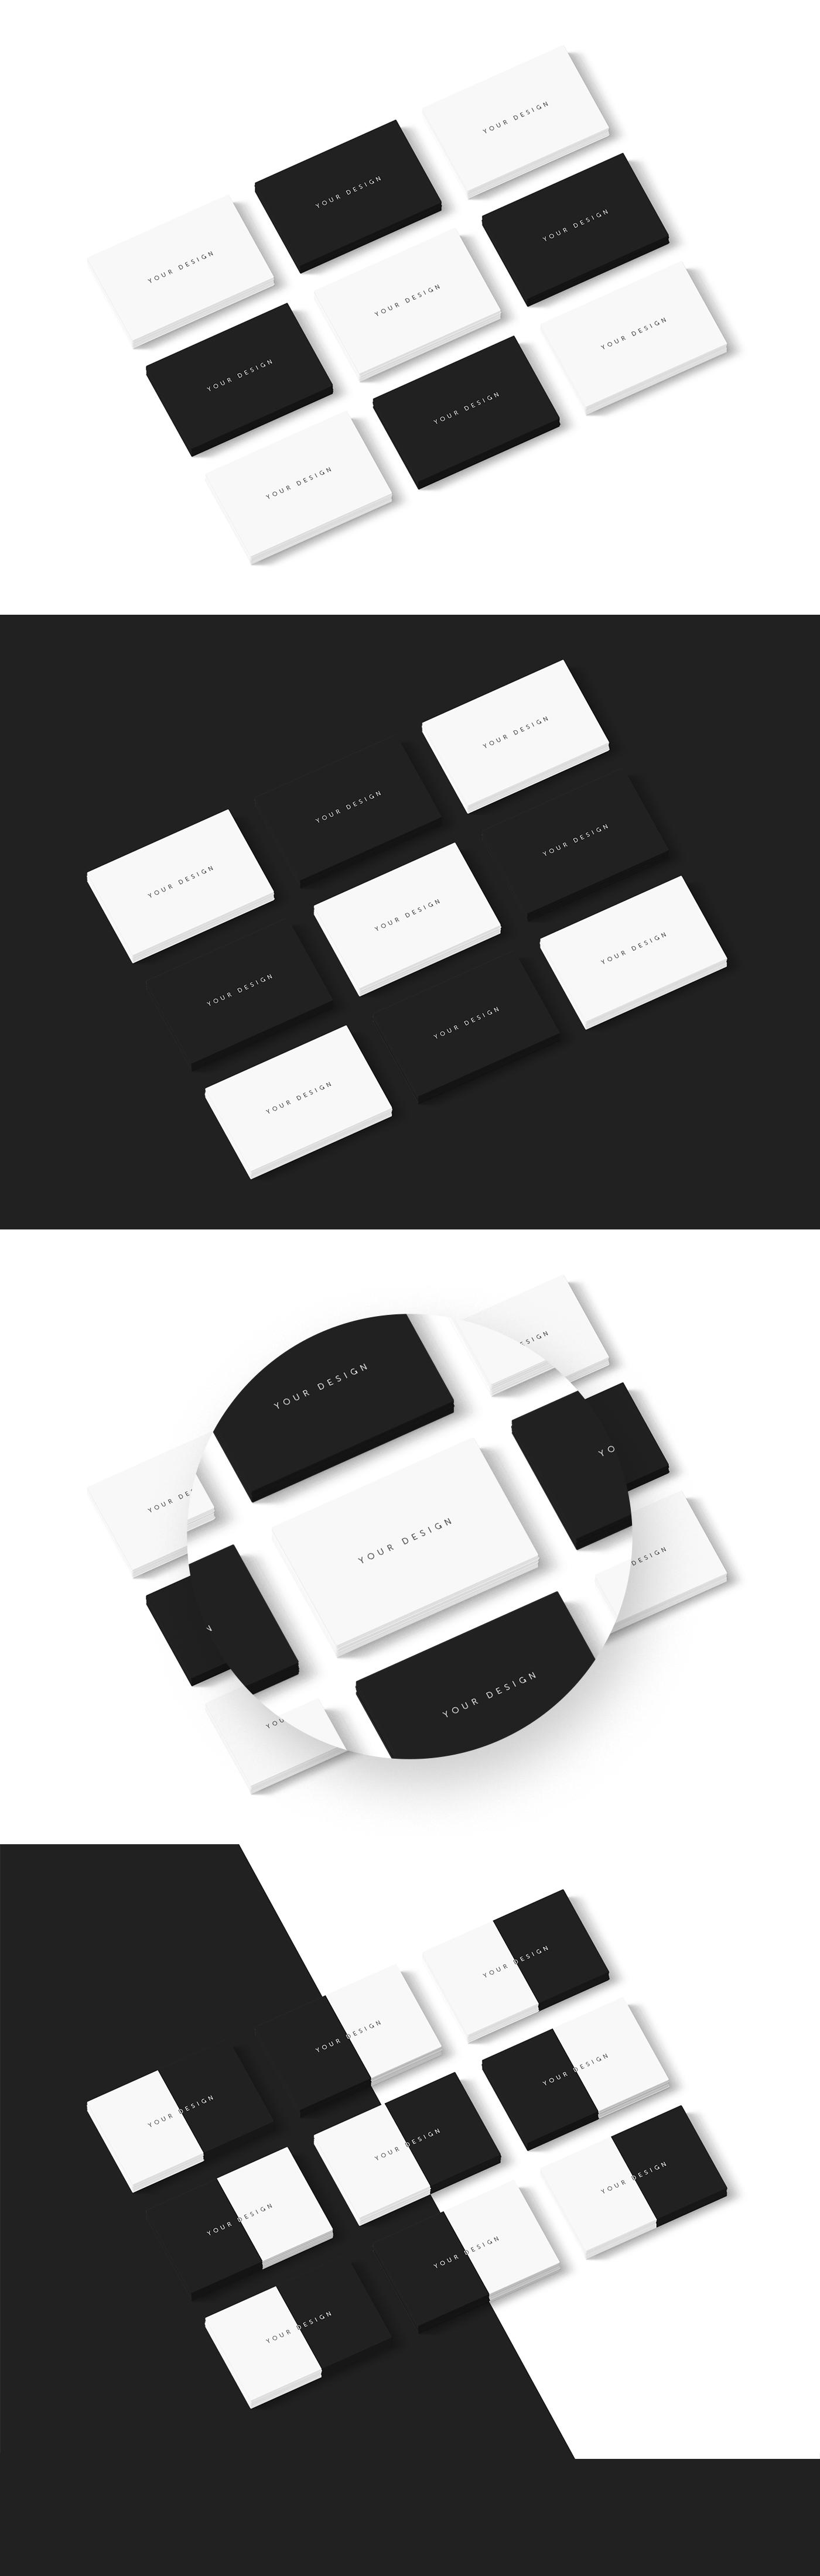 Carte De Visite Name Cards Business Card Free Mockup PSD On Behance